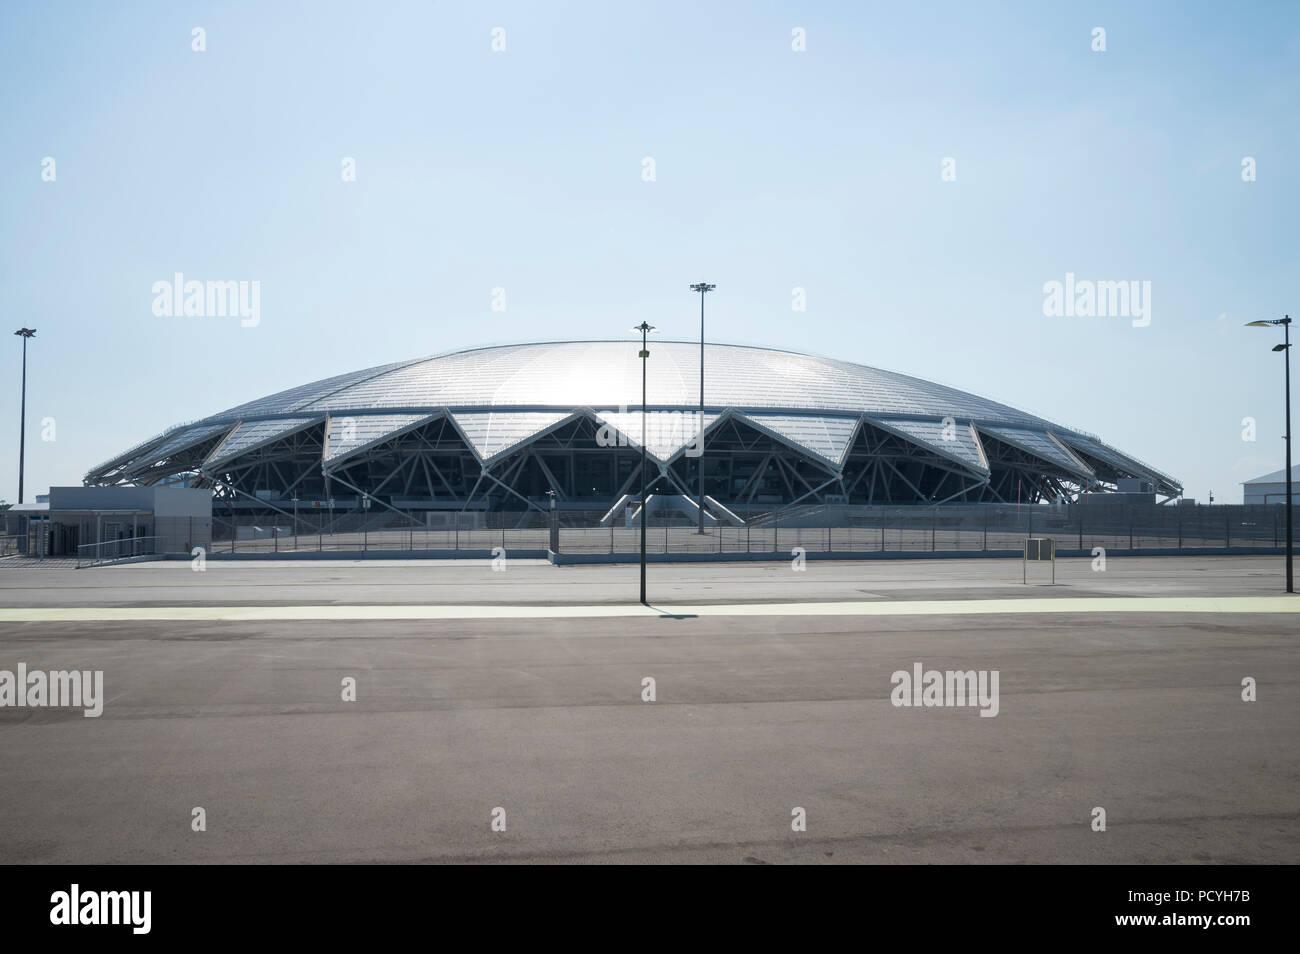 Samara Arena football stadium. Samara - the city hosting the FIFA World Cup in Russia in 2018. - Stock Image